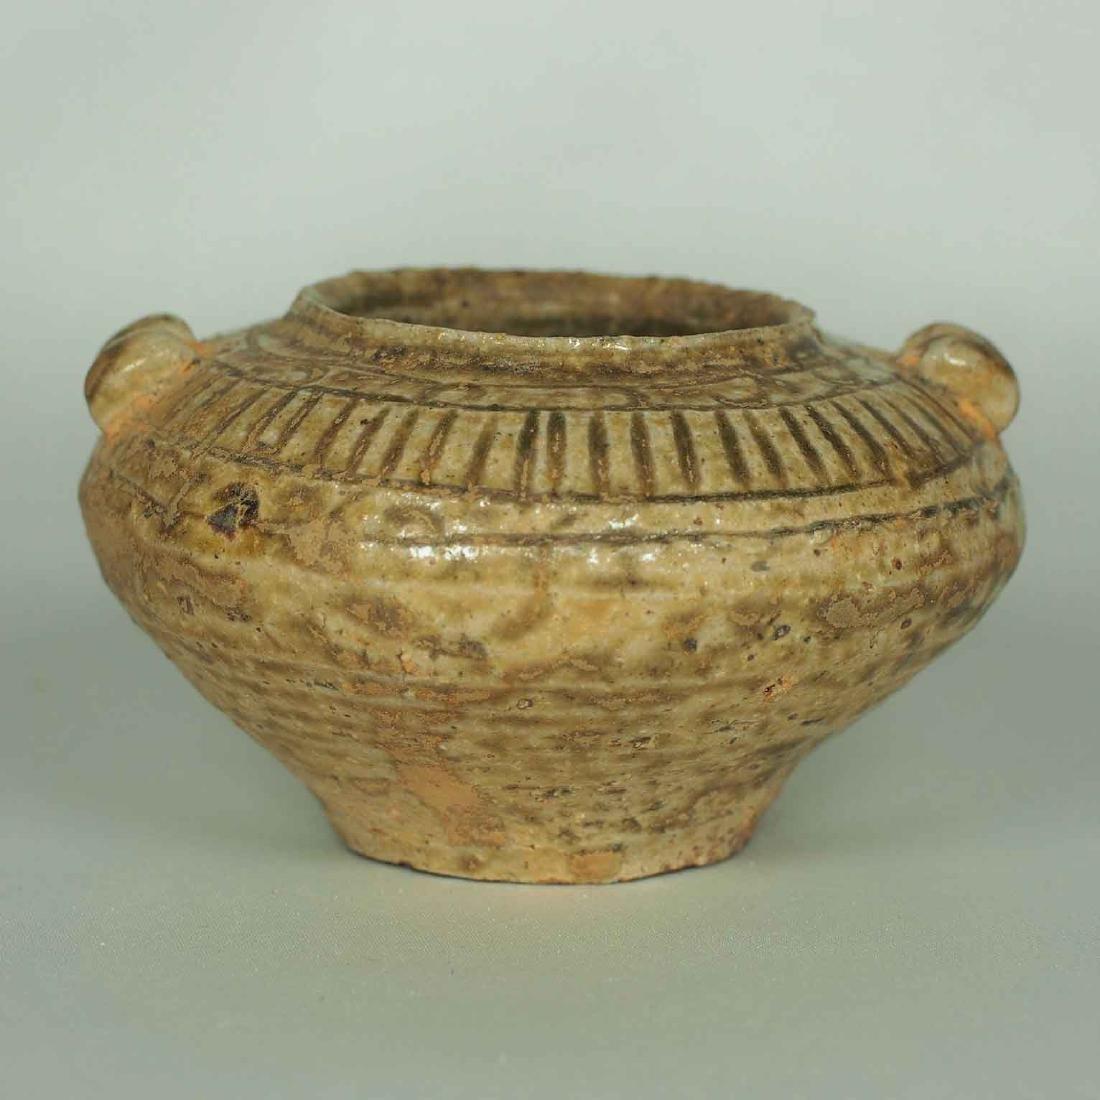 Proto-Porcelain Water Pot, Han Dynasty